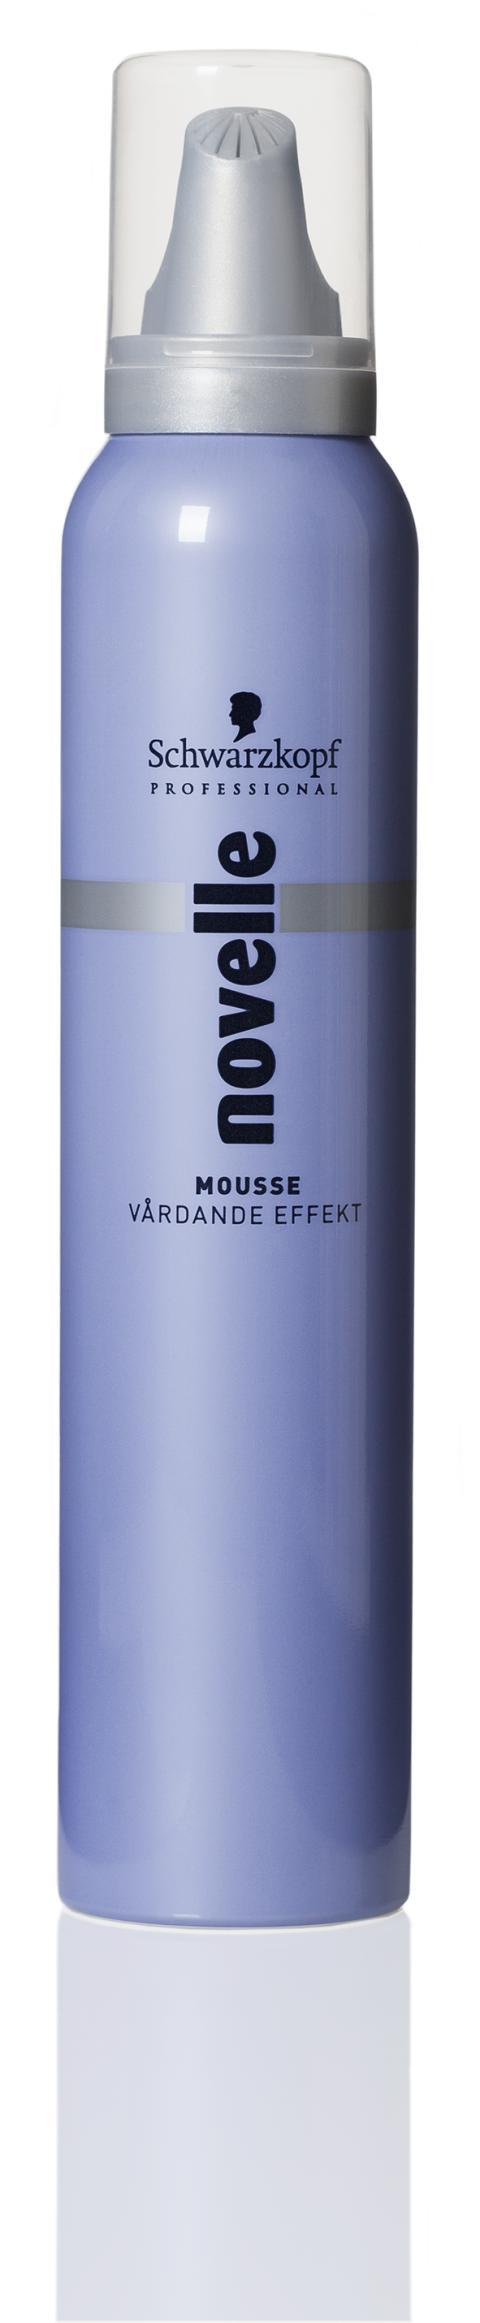 Schwarzkopf Novelle - Mousse